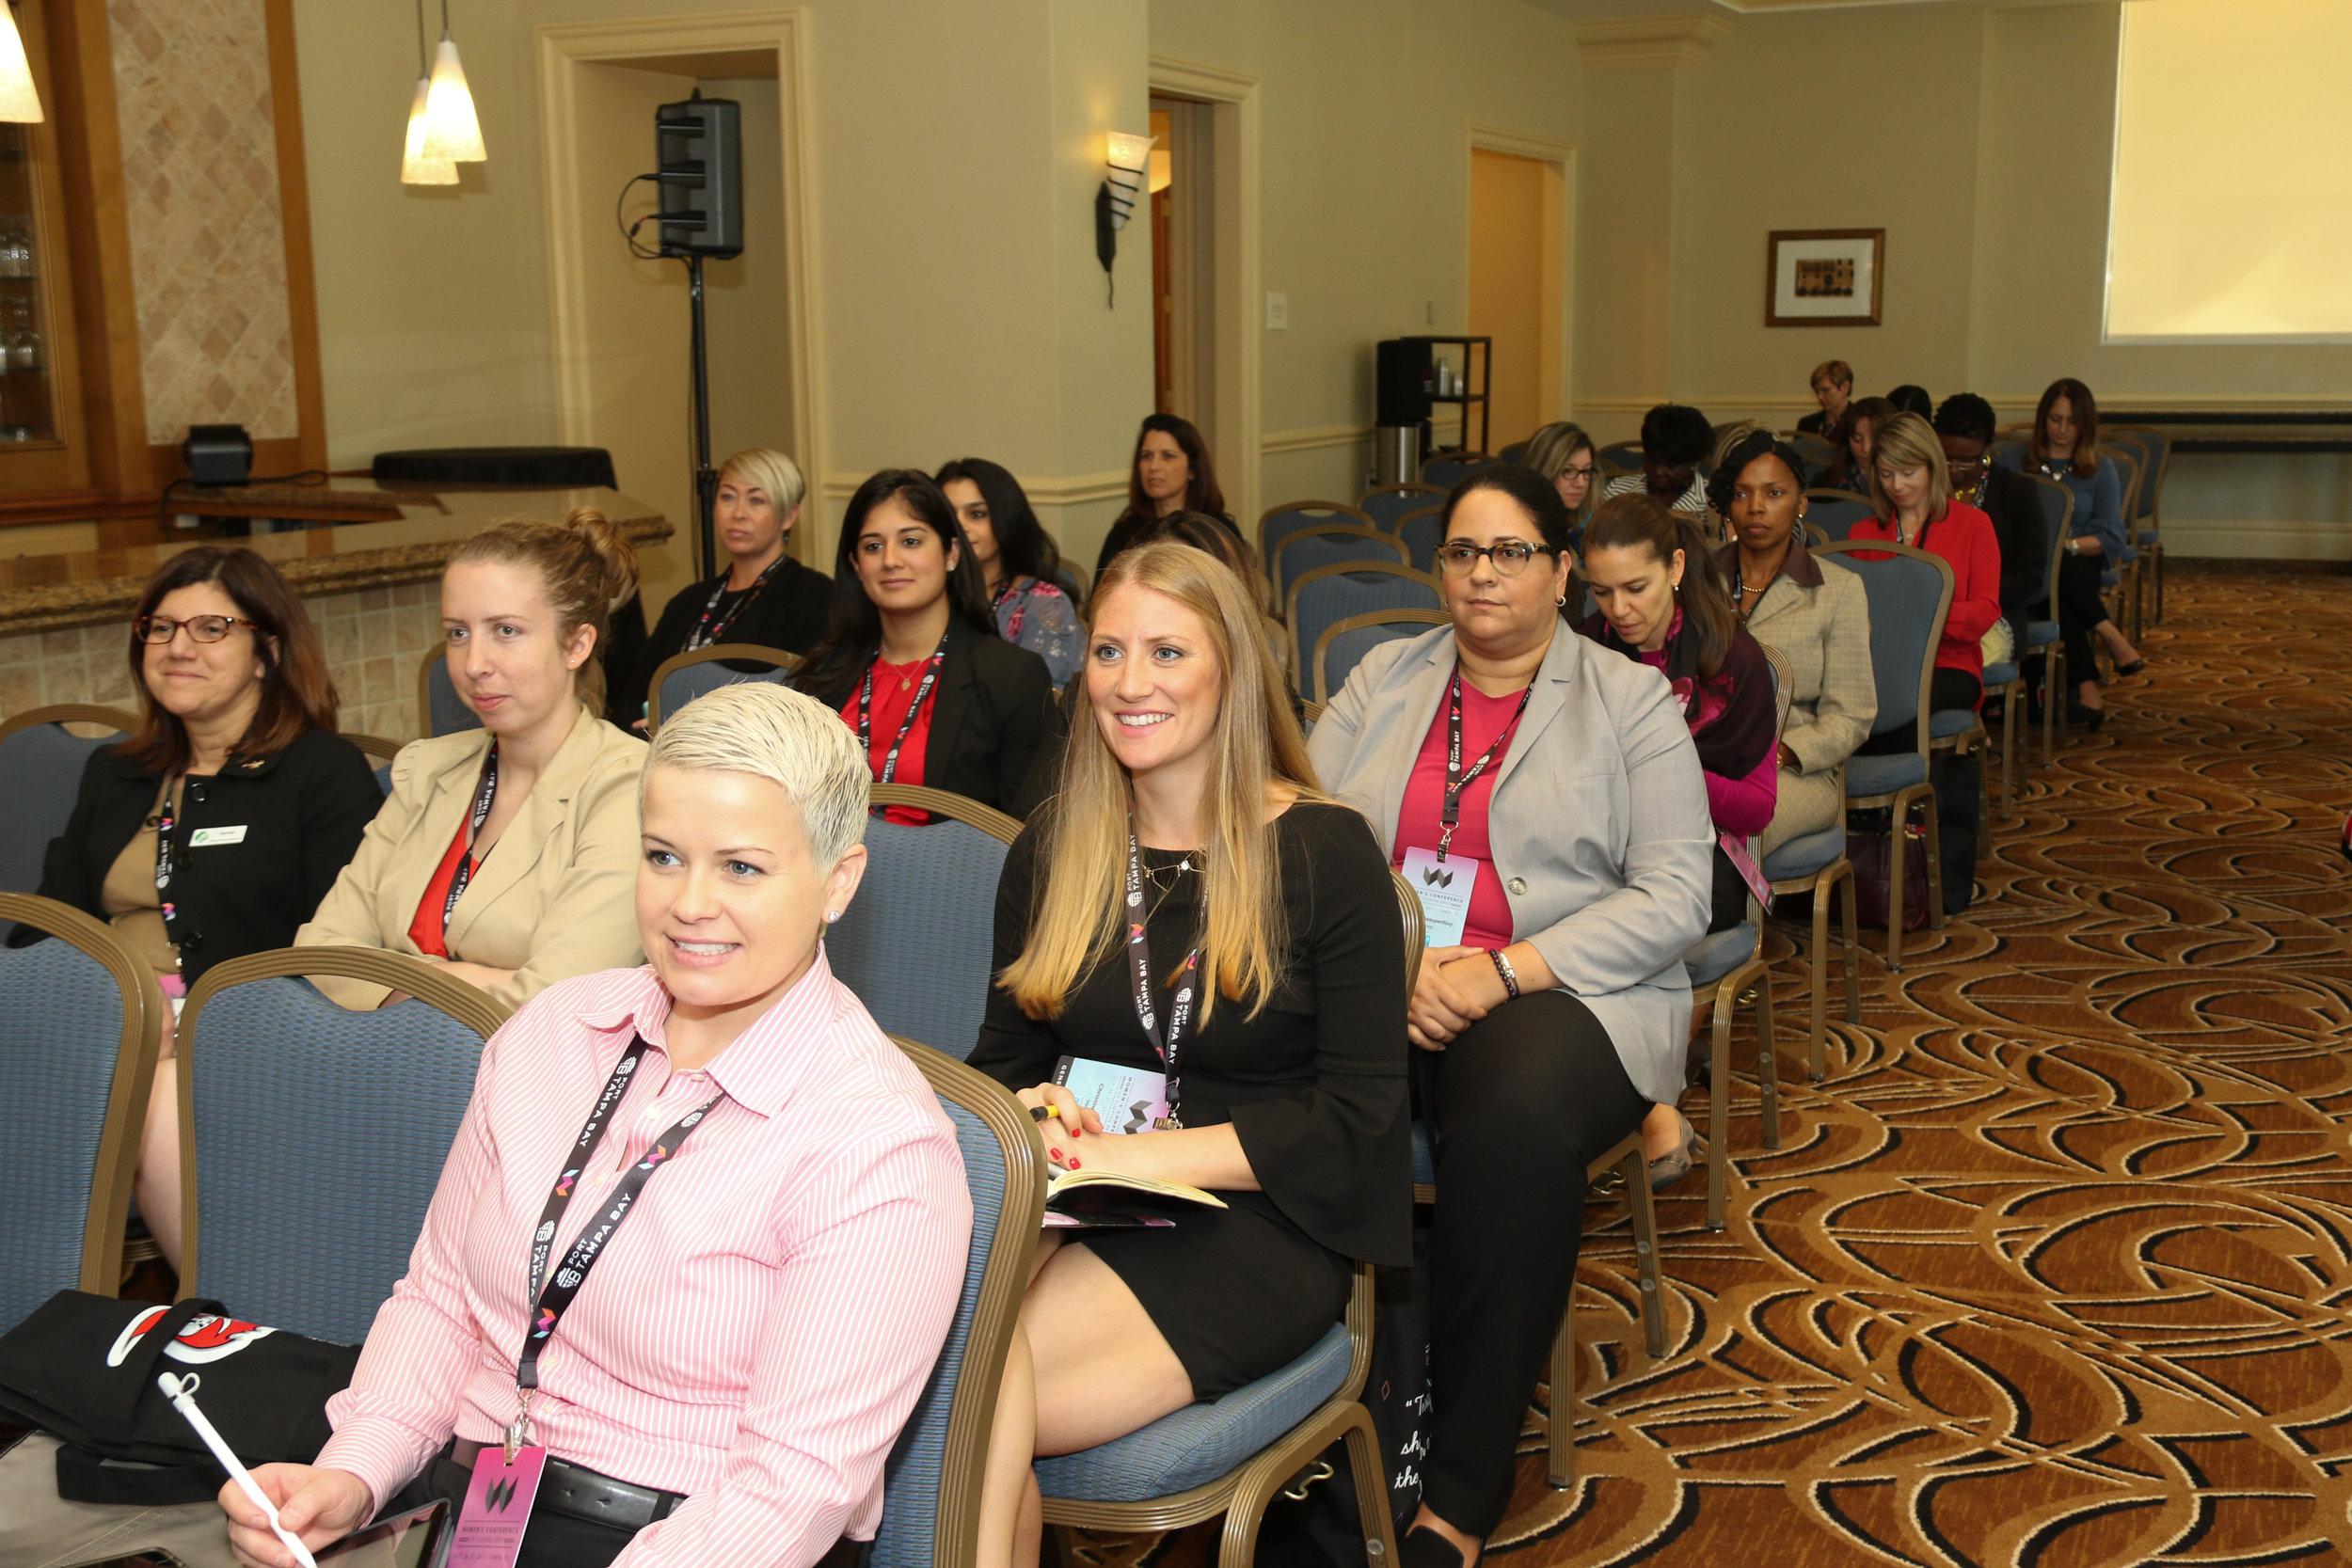 264_WomensConference_10-26-17.jpg